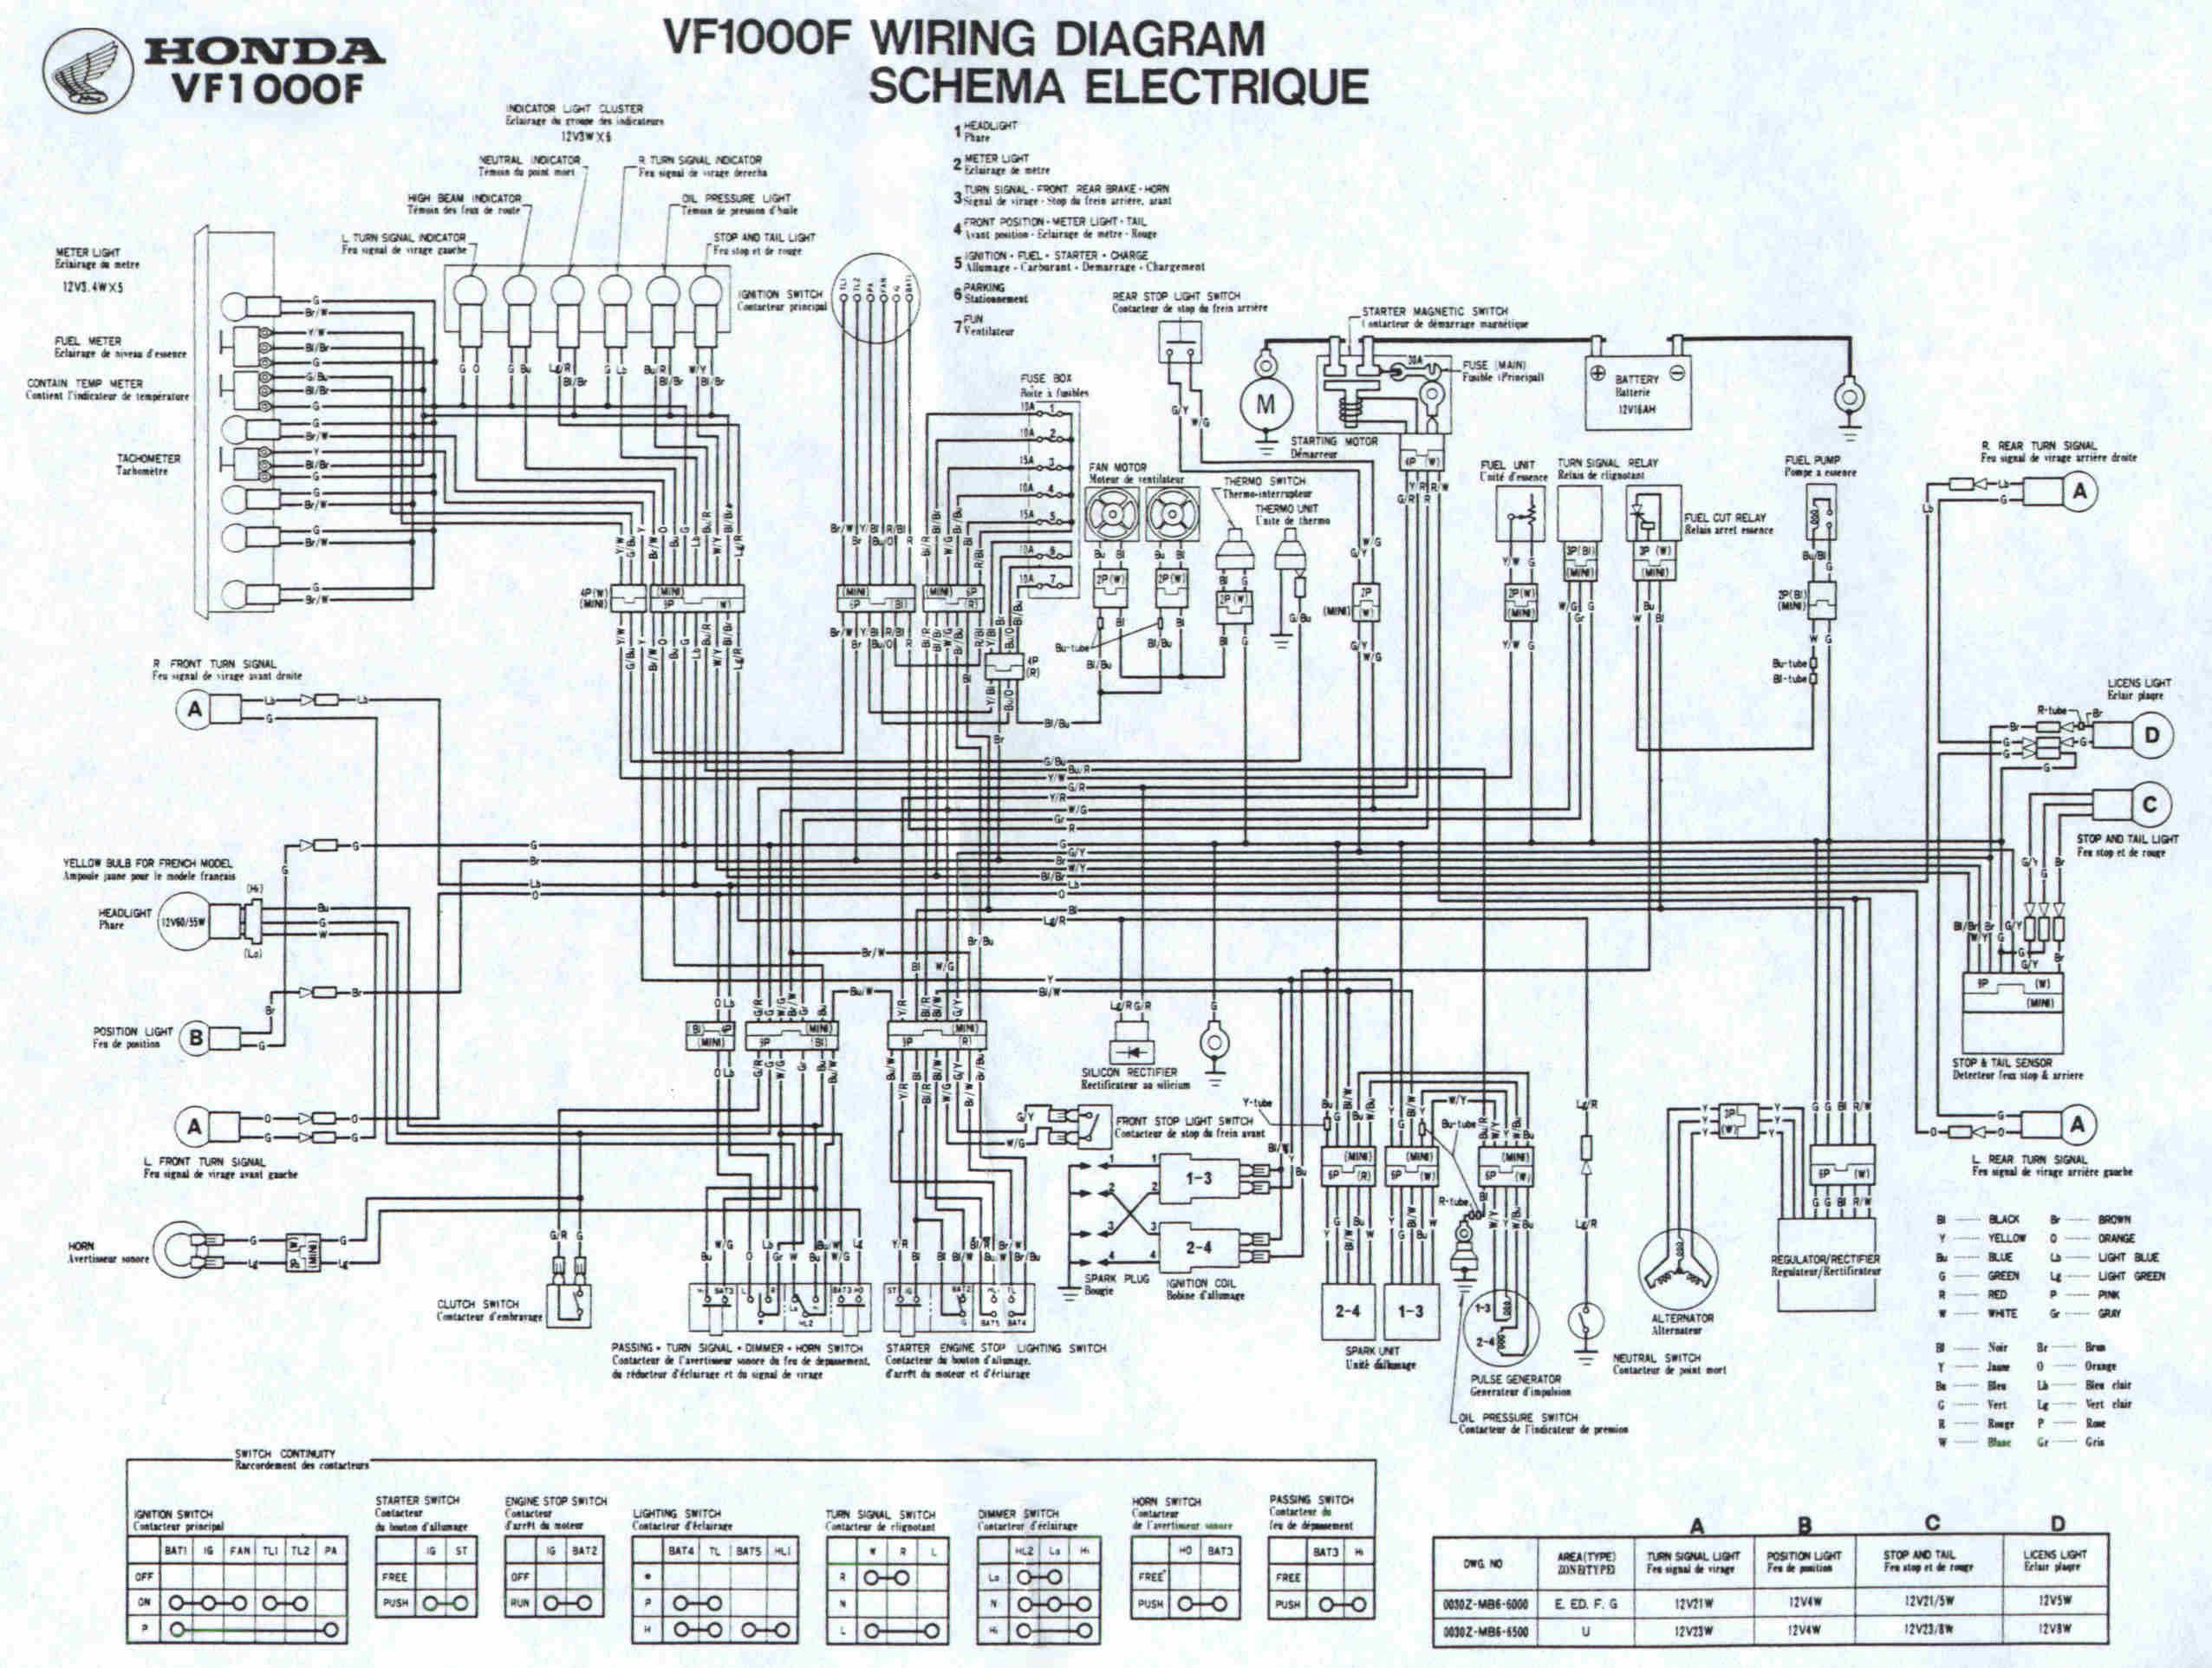 Honda F3 Wiring Diagram - Wiring Diagram Replace wait-progressive -  wait-progressive.miramontiseo.it   Wiring Diagram For 1998 Cbr 600 F3      wait-progressive.miramontiseo.it